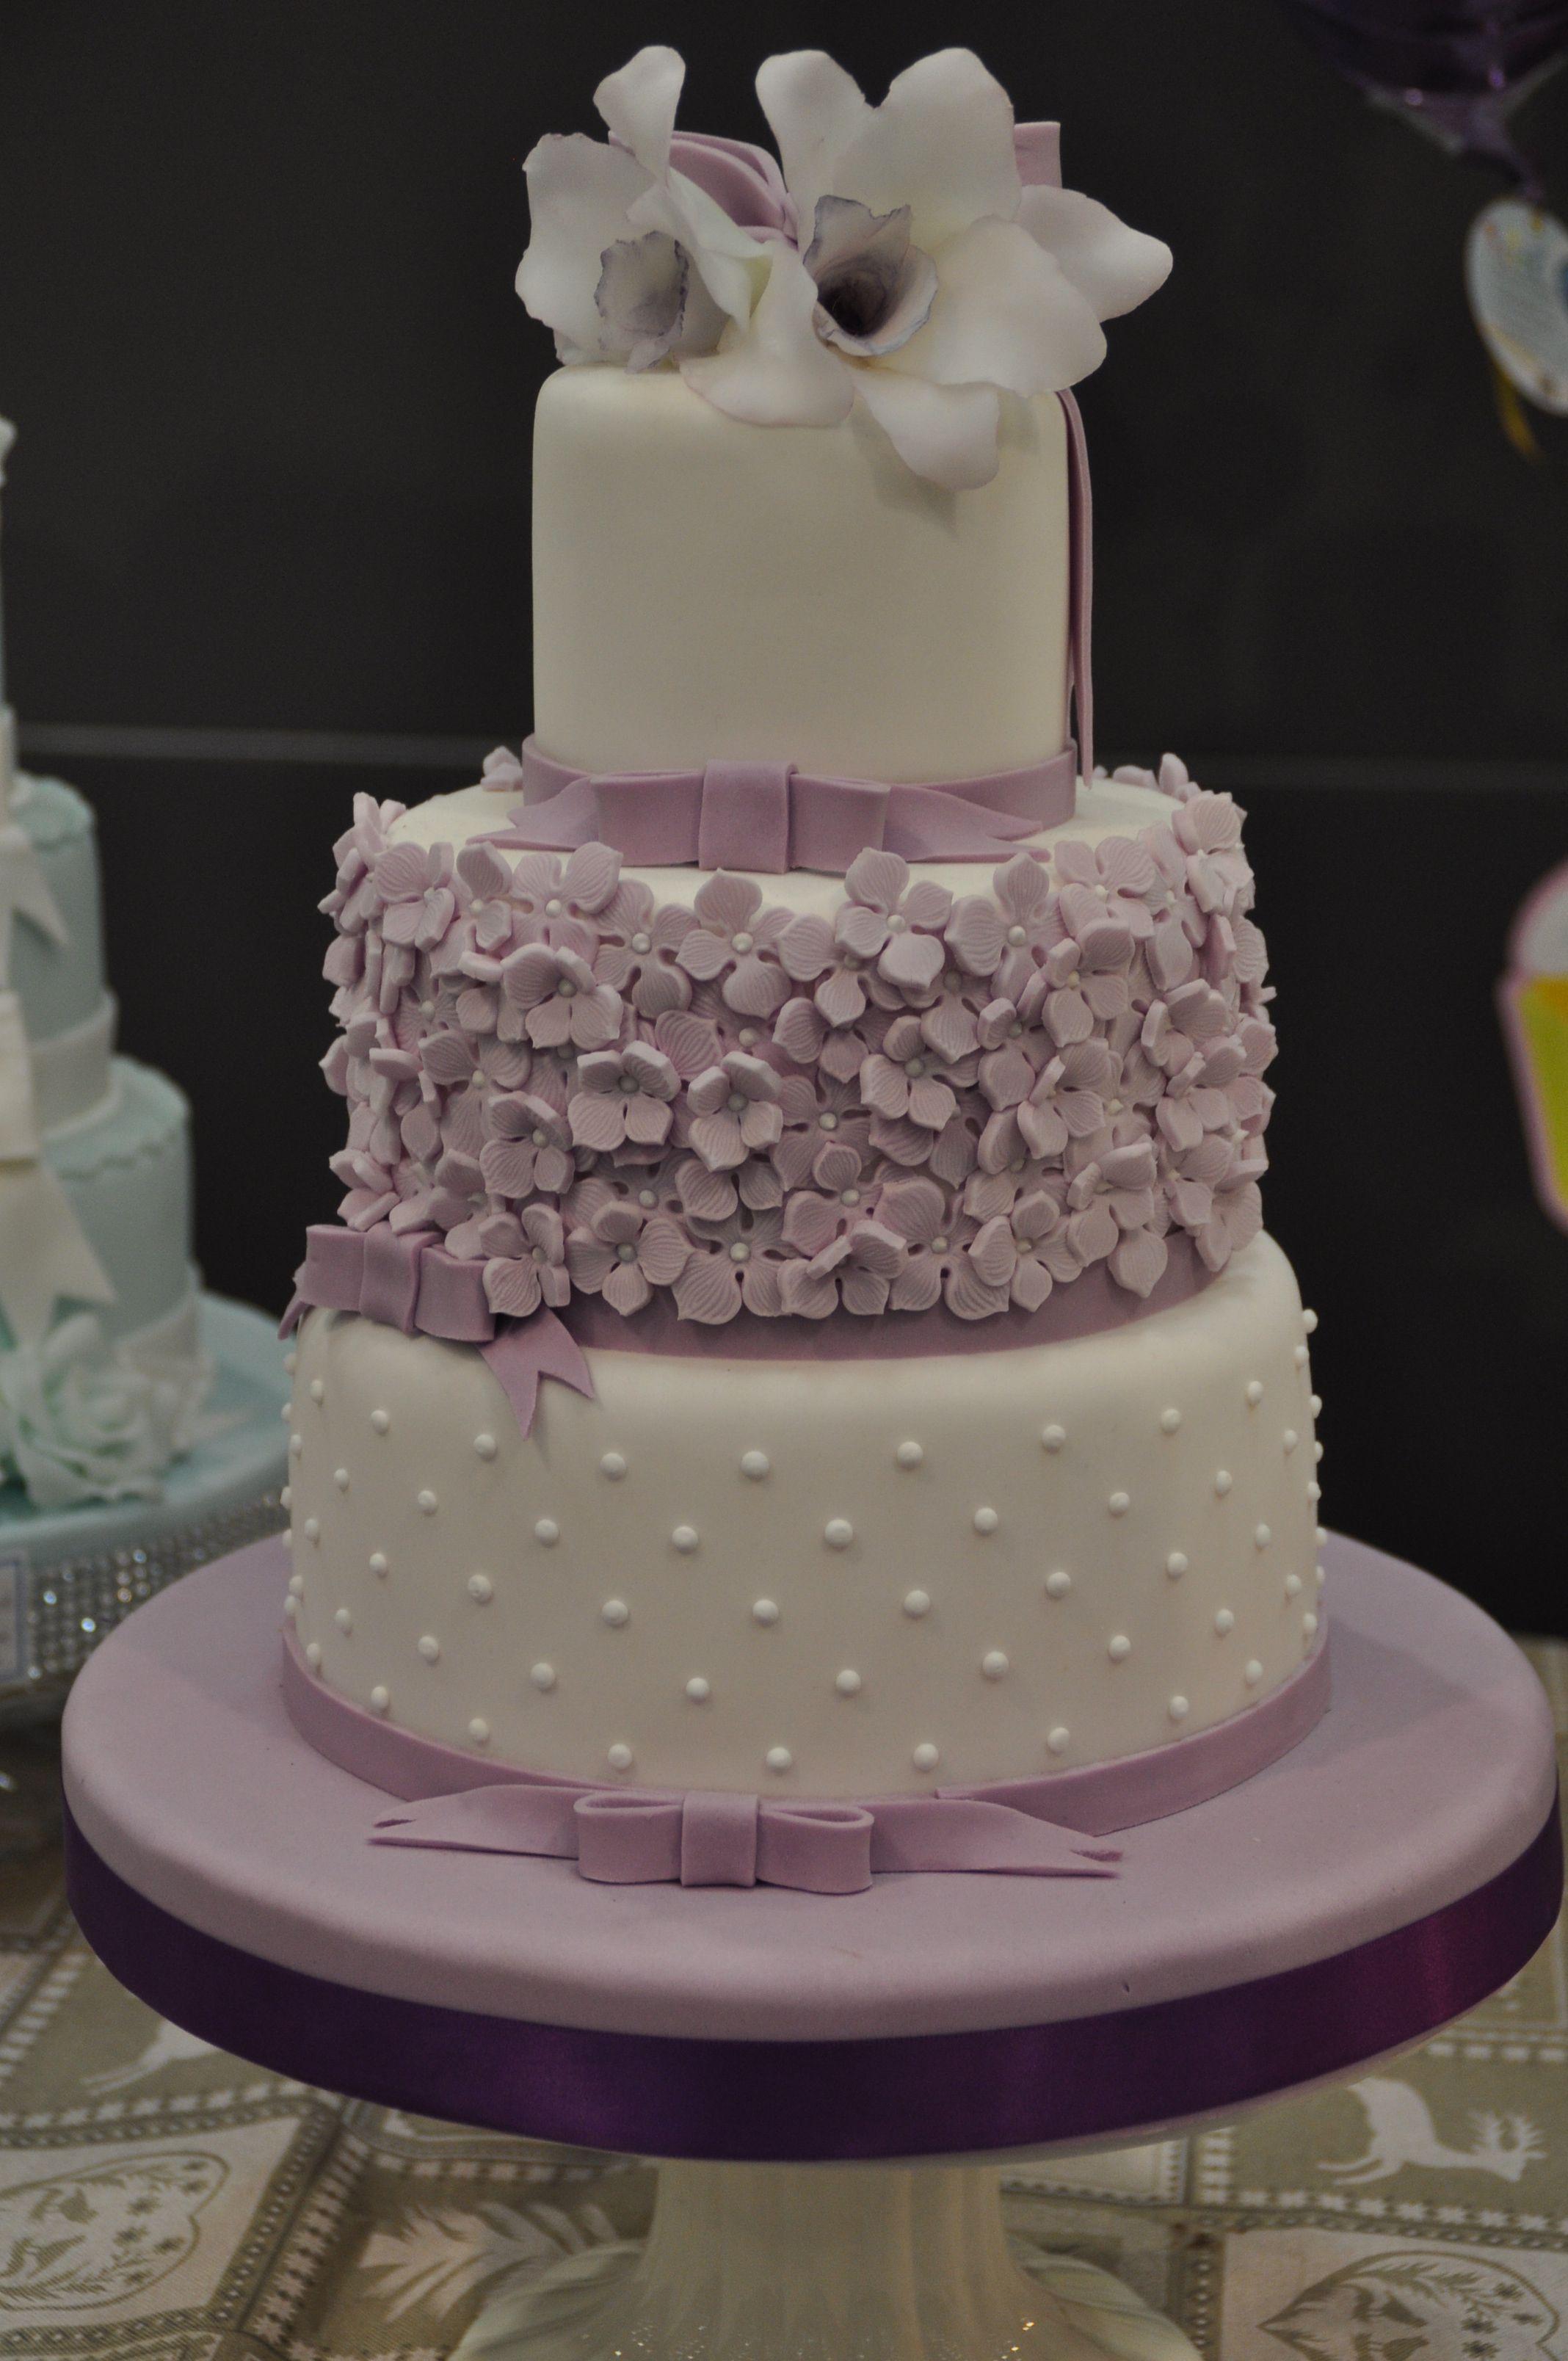 Torte Cake Design Milano : le-torte-di-giada-cake-design-senza-glutine 1 - Ginger ...